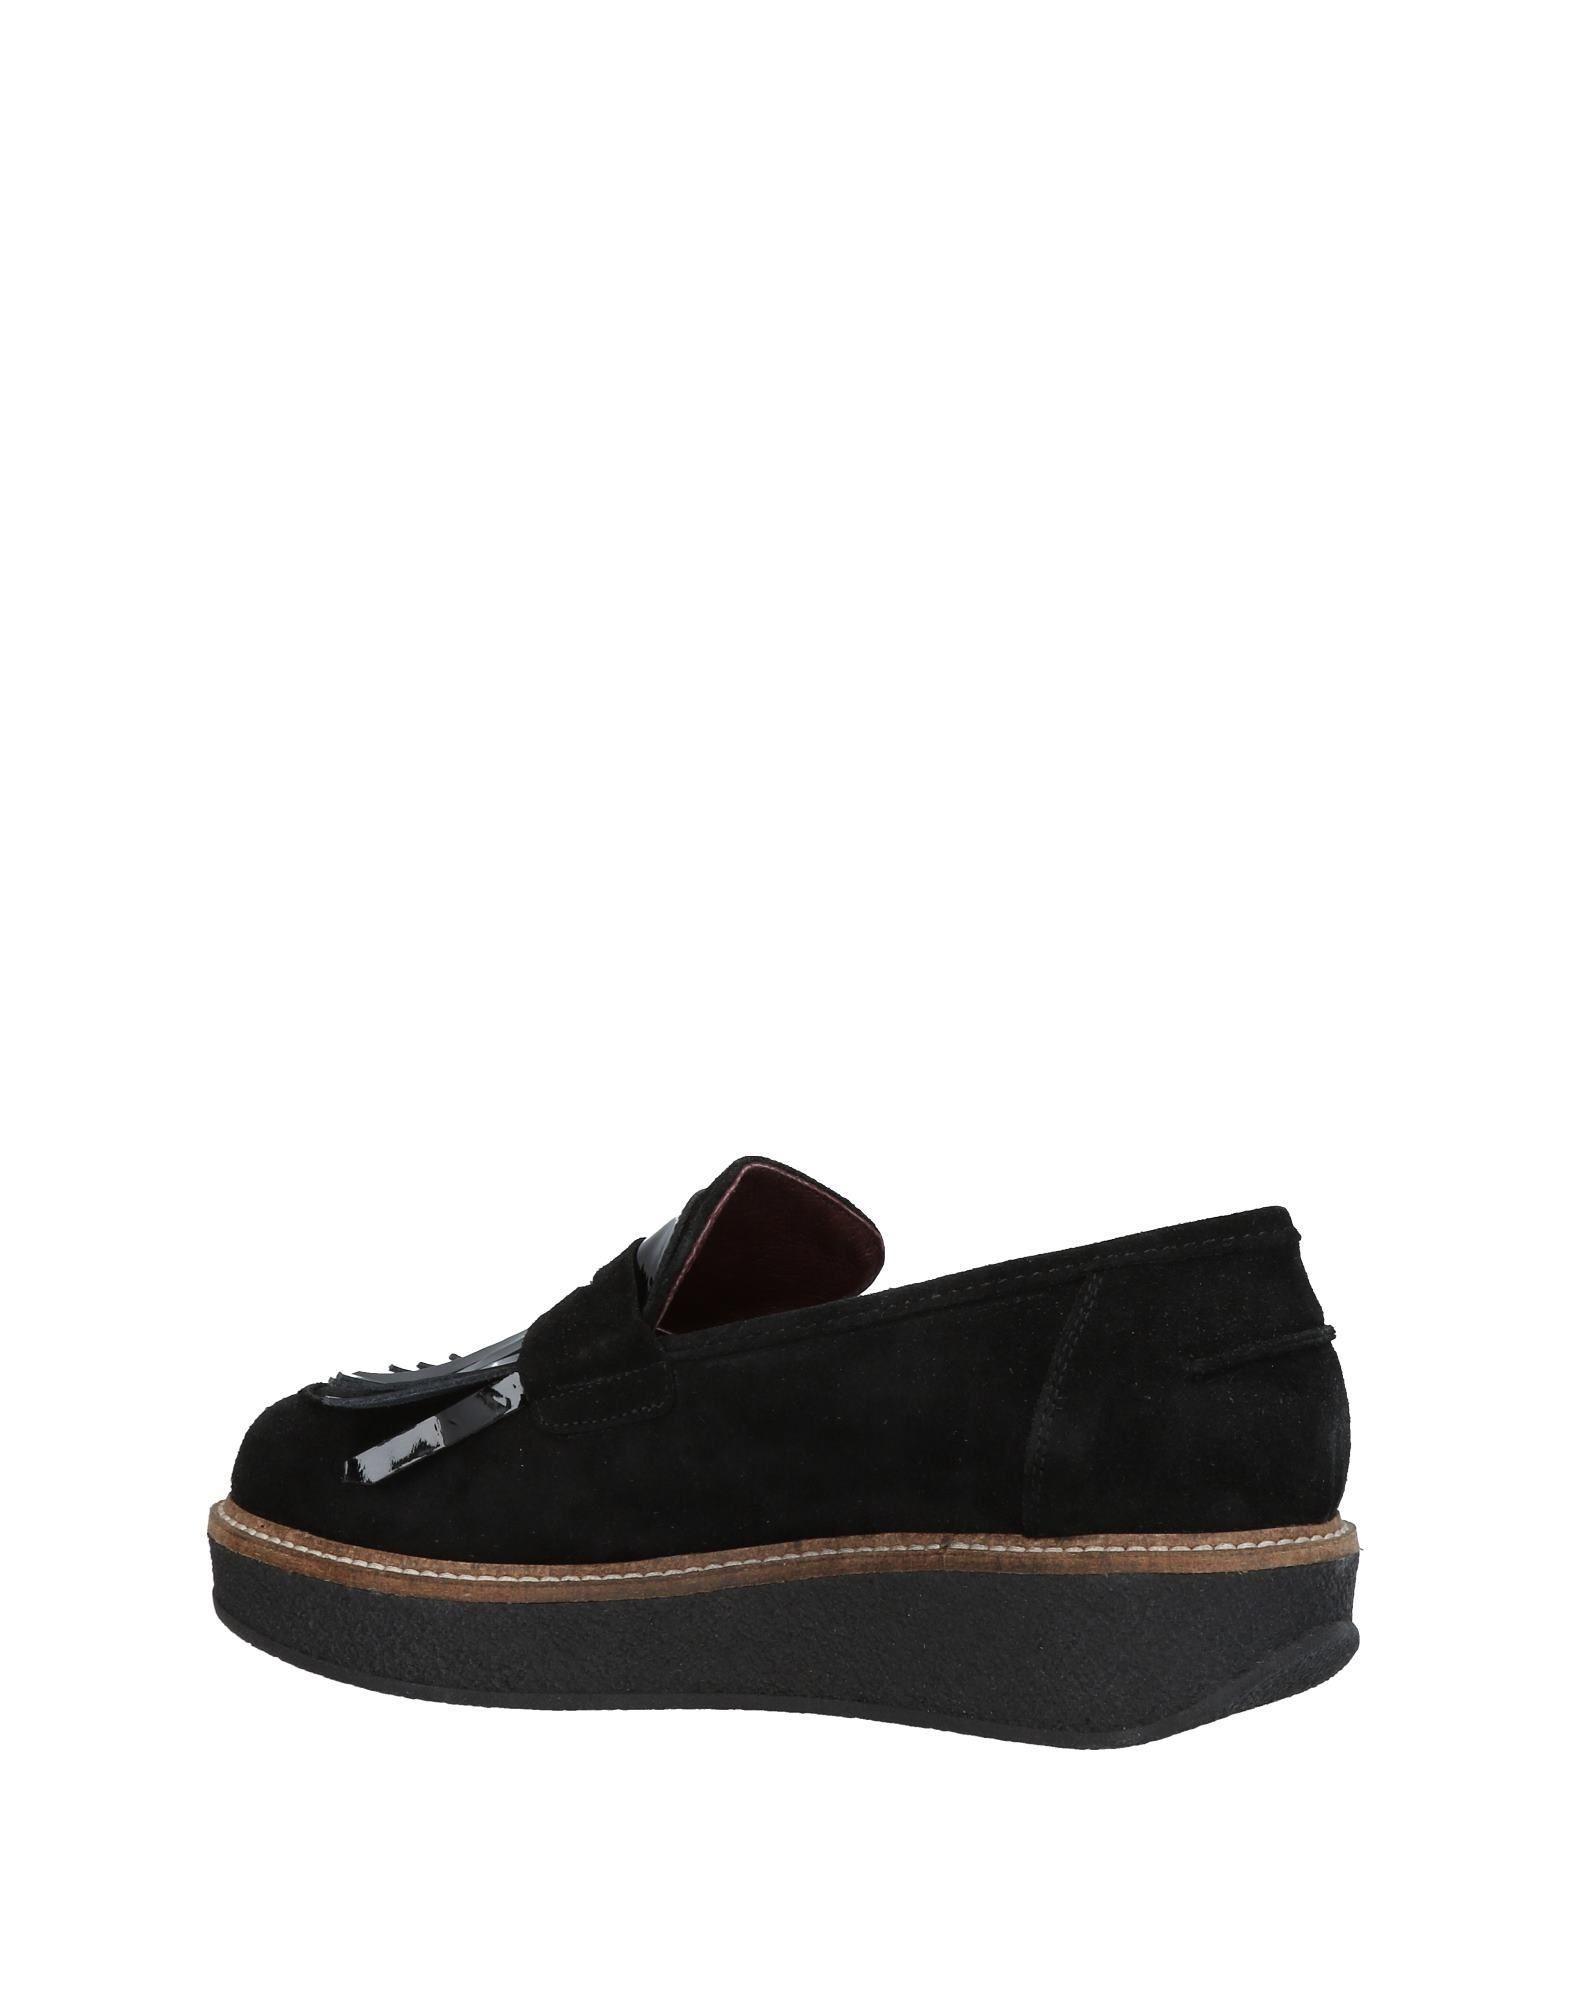 Footwear Marina Grey Black Women's Leather